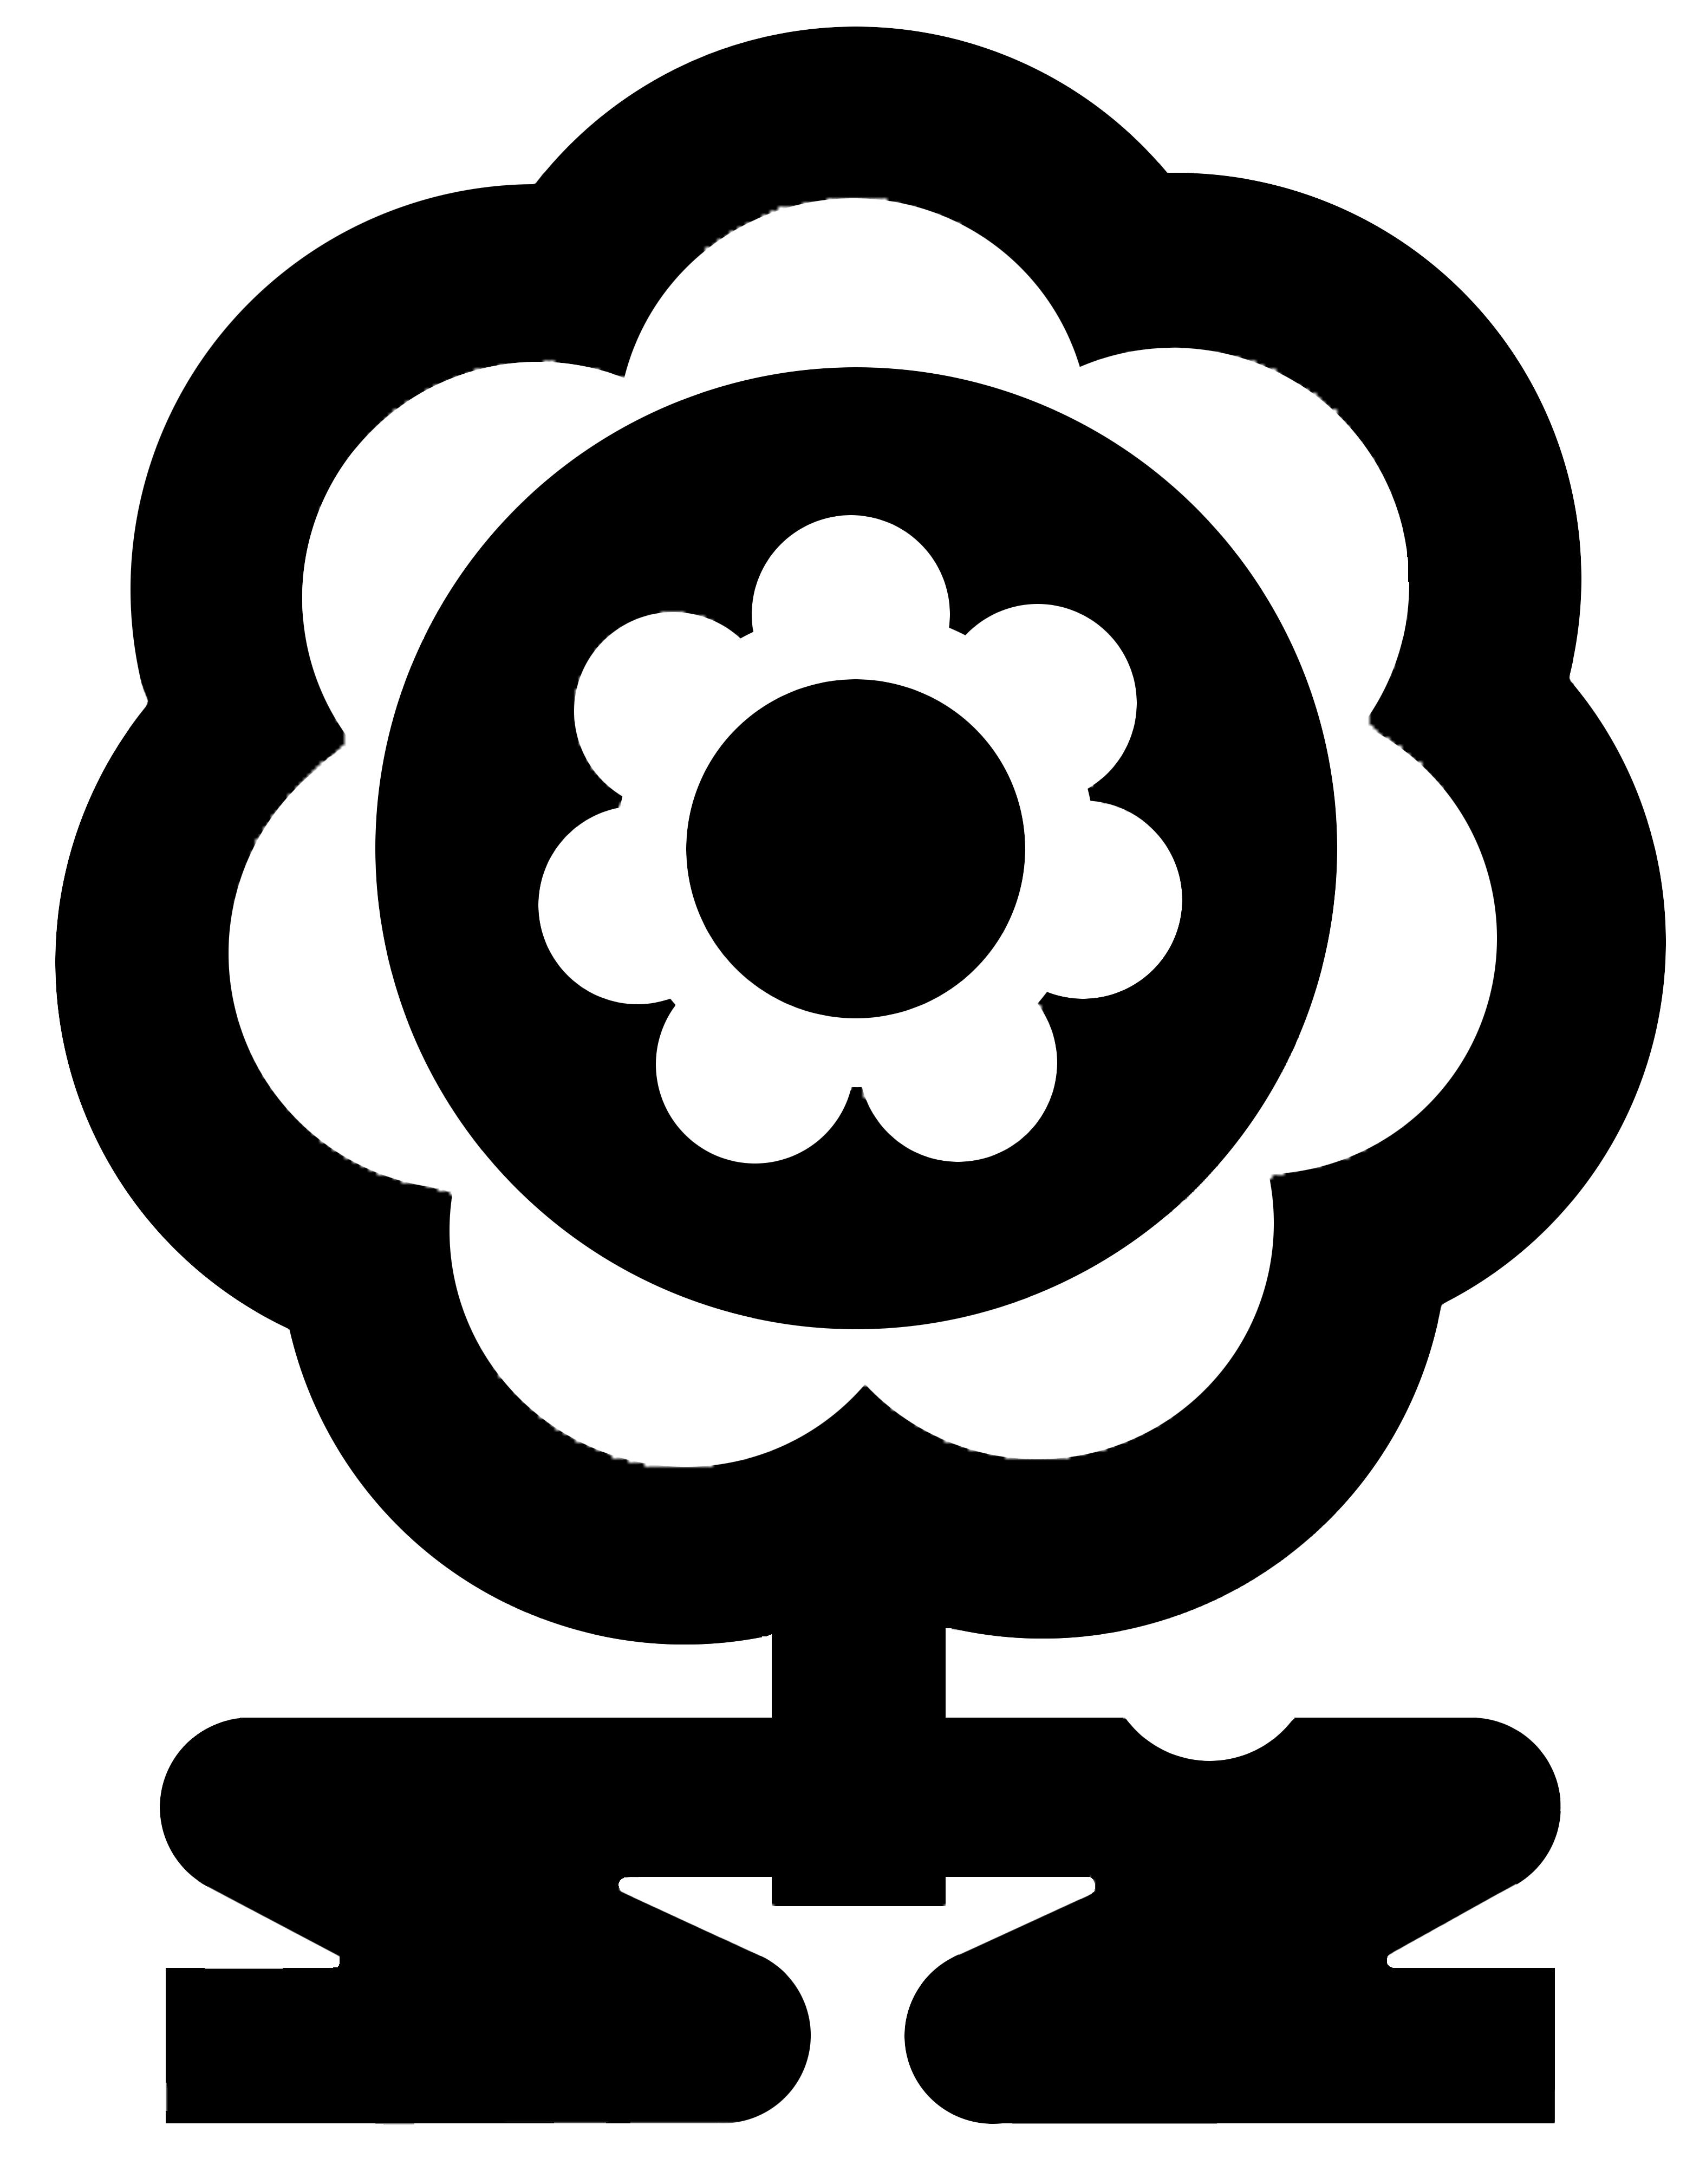 logo-sz-pozitivne-nove